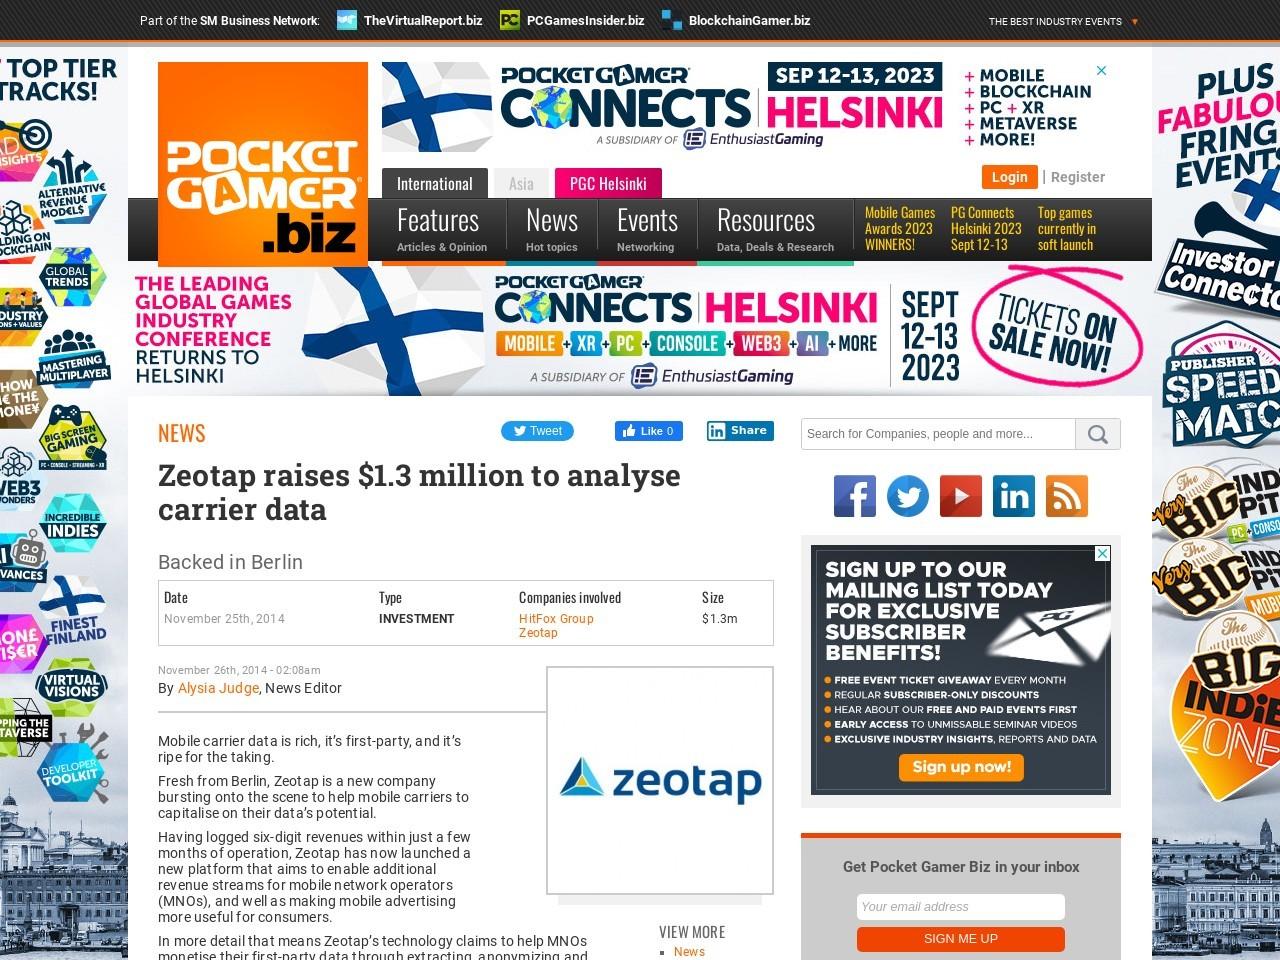 Zeotap raises $1.3 million to analyse carrier data